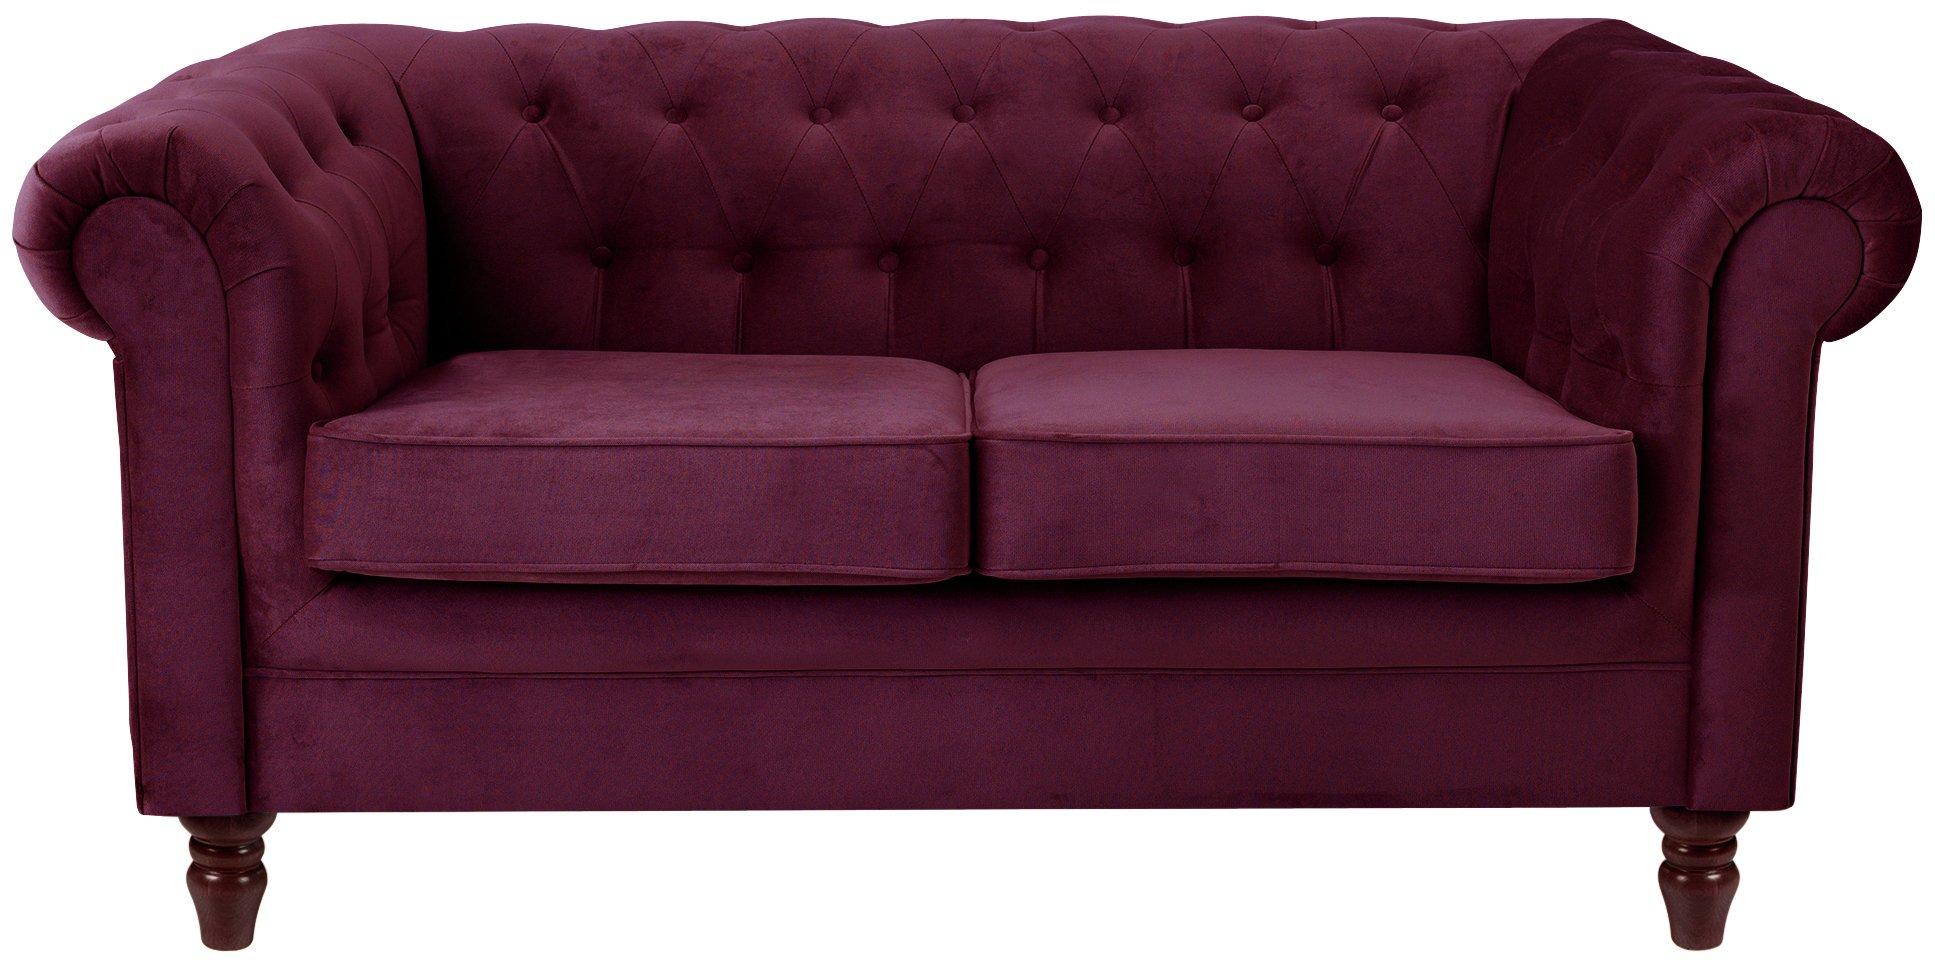 Black Friday Sofa Deals Uk Refil Sofa : 4279631RZ001A from forexrefiller.com size 1935 x 972 jpeg 200kB